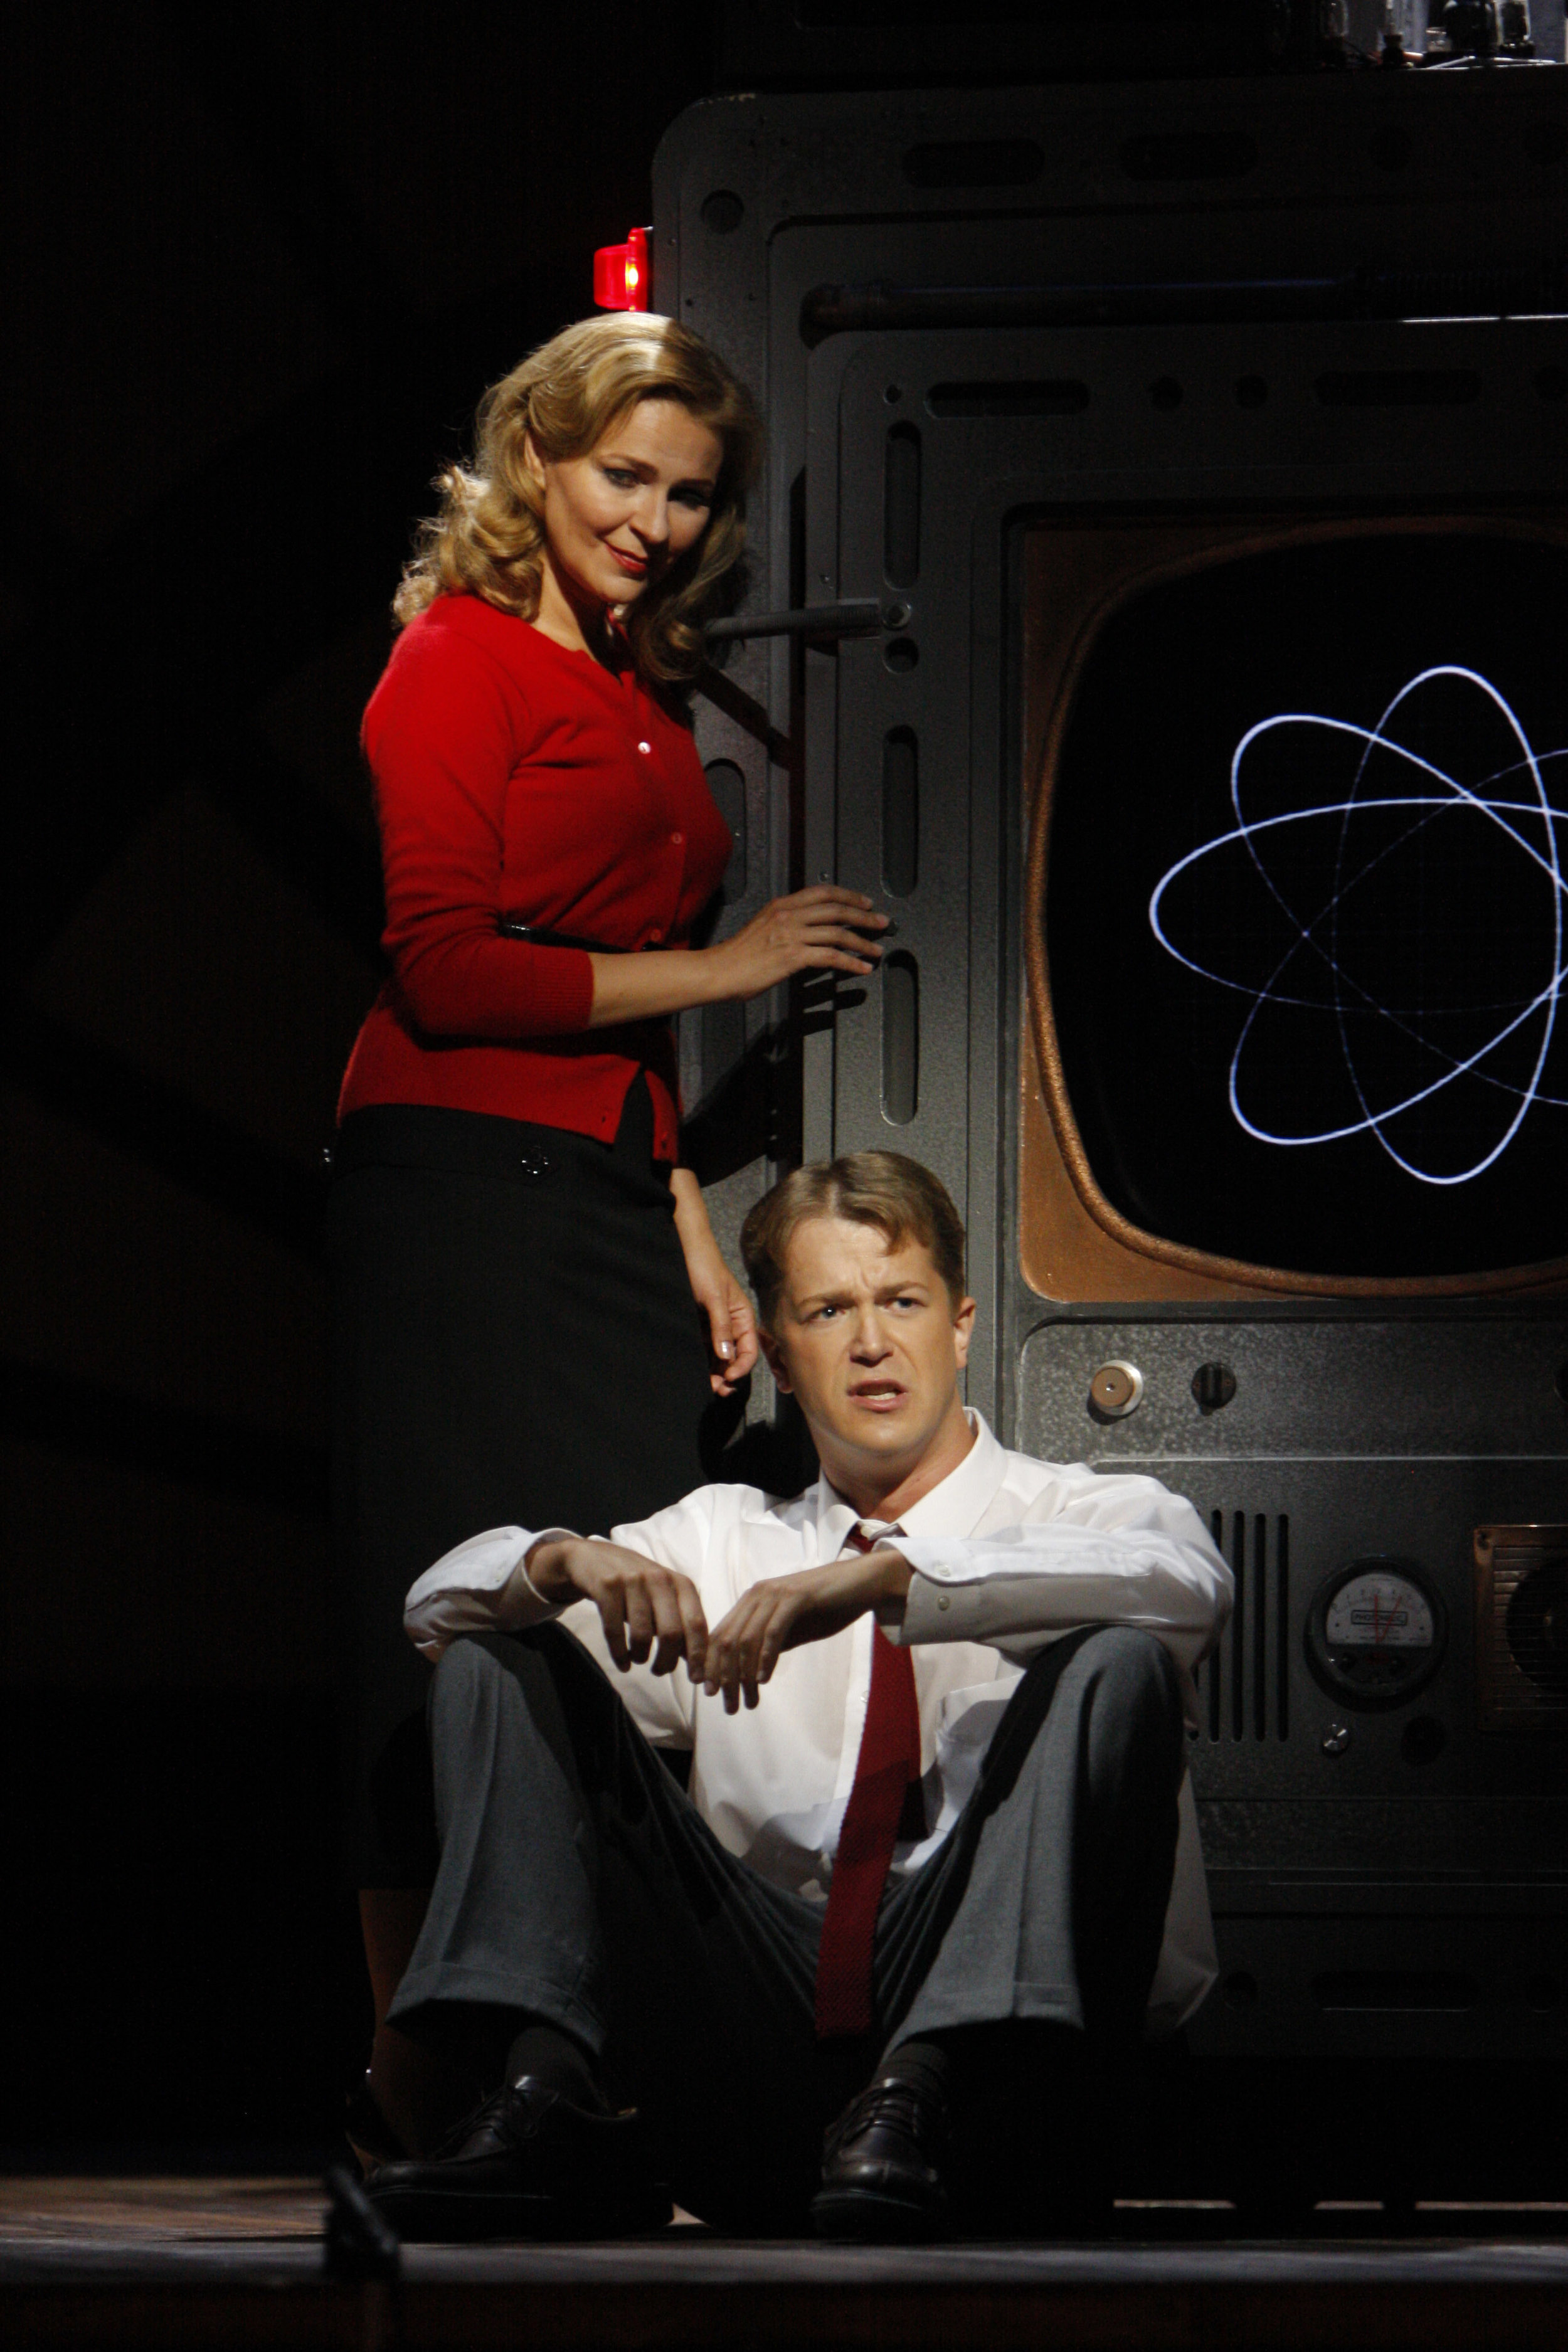 Ruxandra Donose as Veronica Quaife and Daniel Okulitch as Seth Brundle in The Fly 图片来源: Robert Millard, 美国洛杉矶歌剧院, 2008